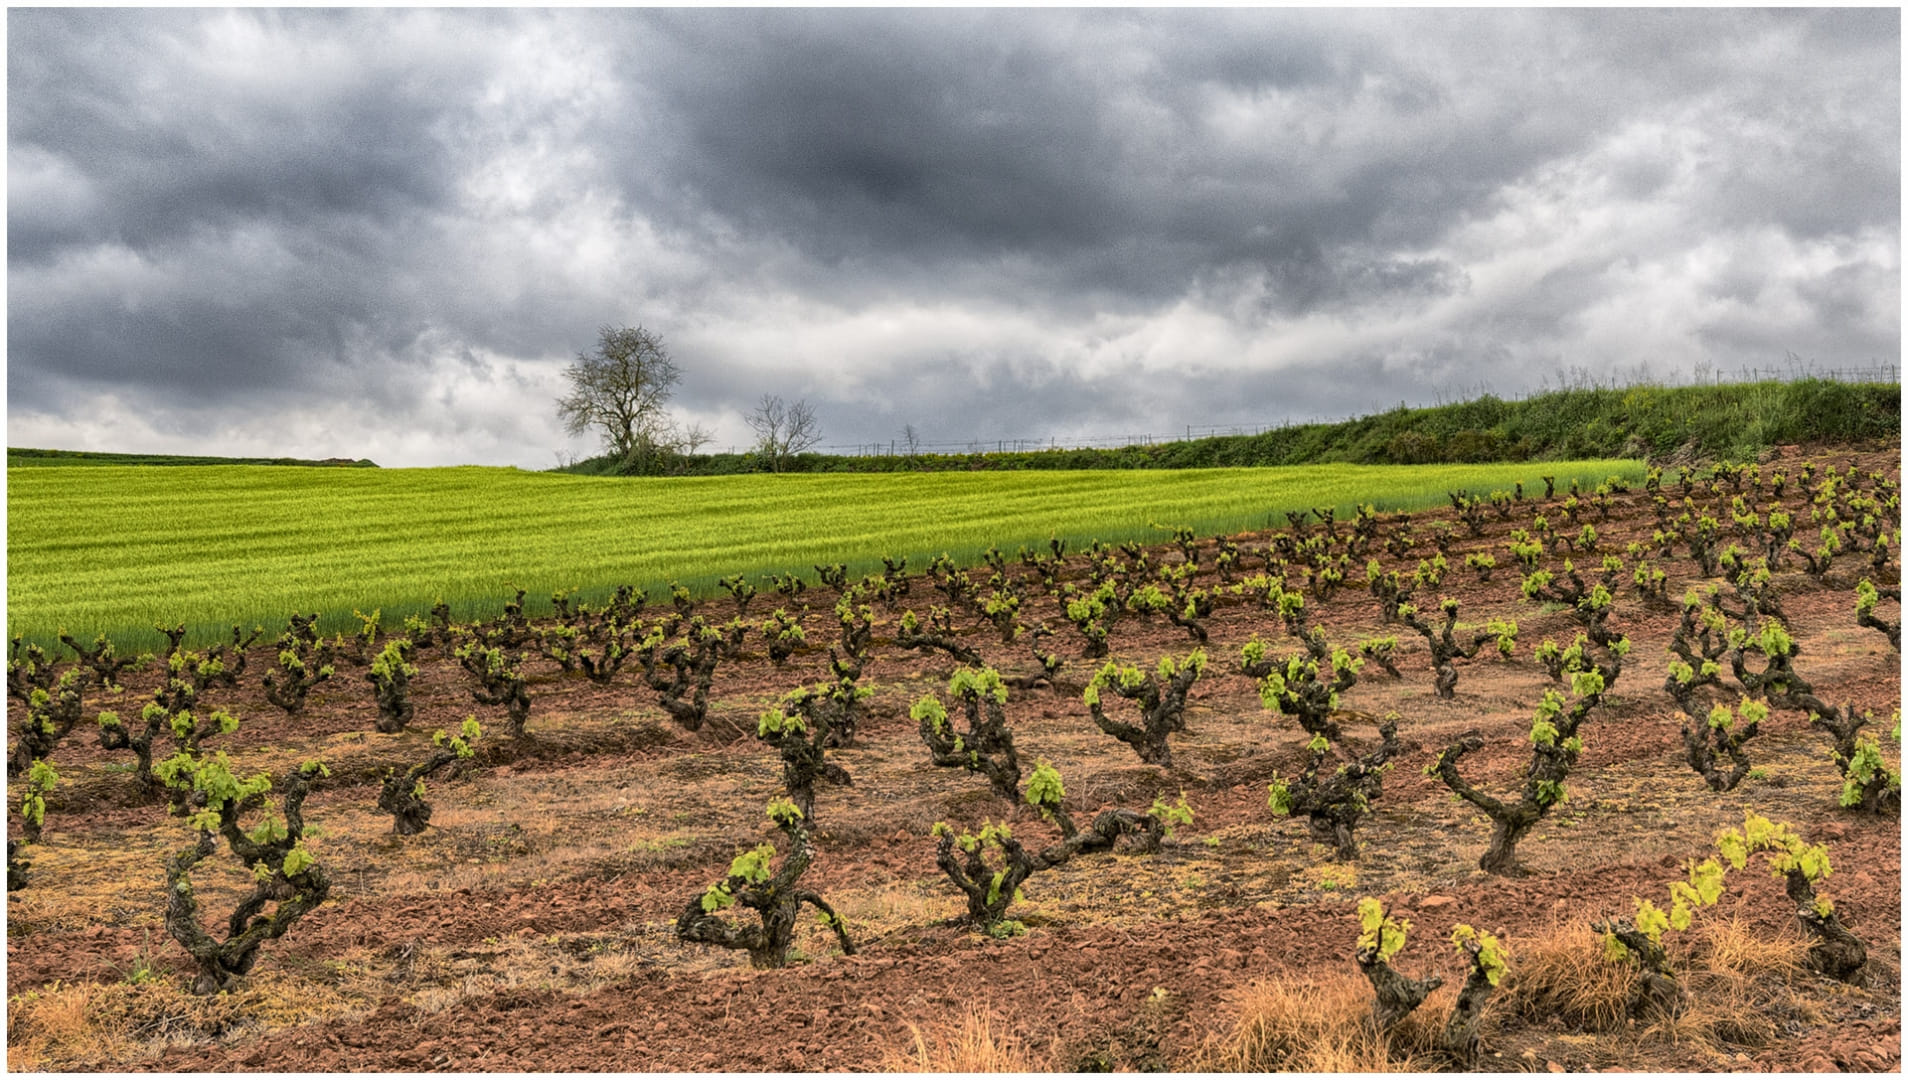 Viñas verdes